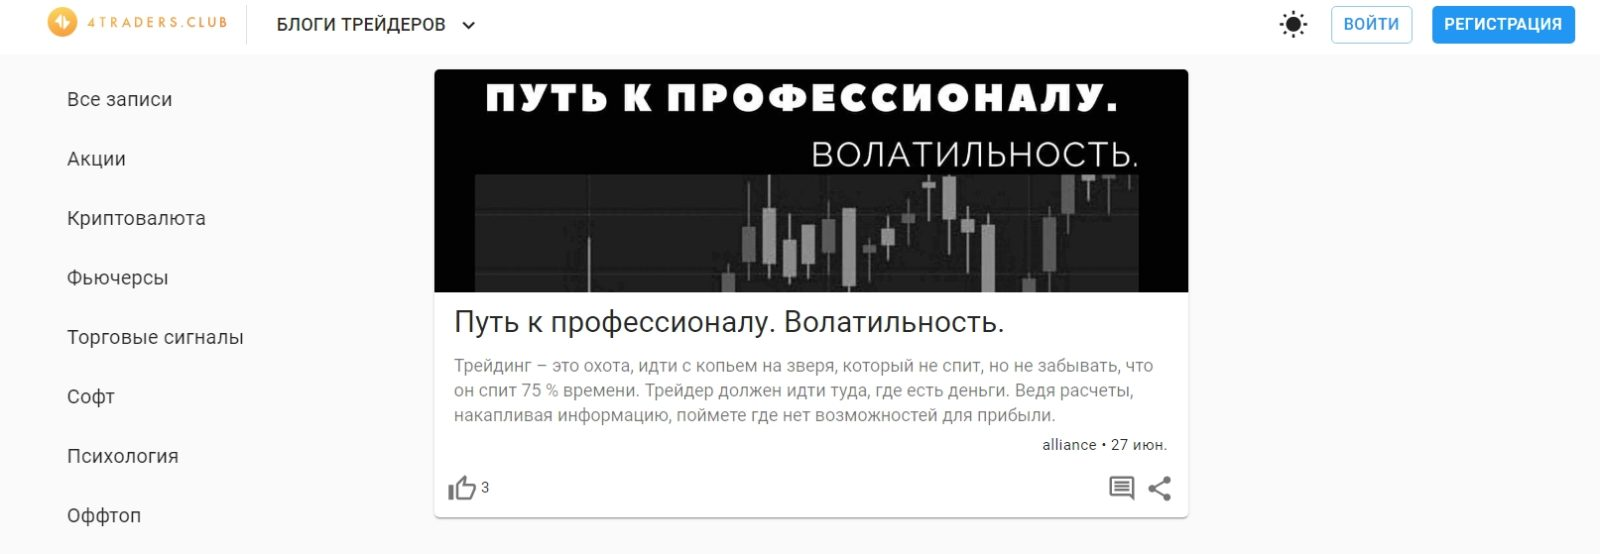 Сайт 4Traders Павла Жуковского